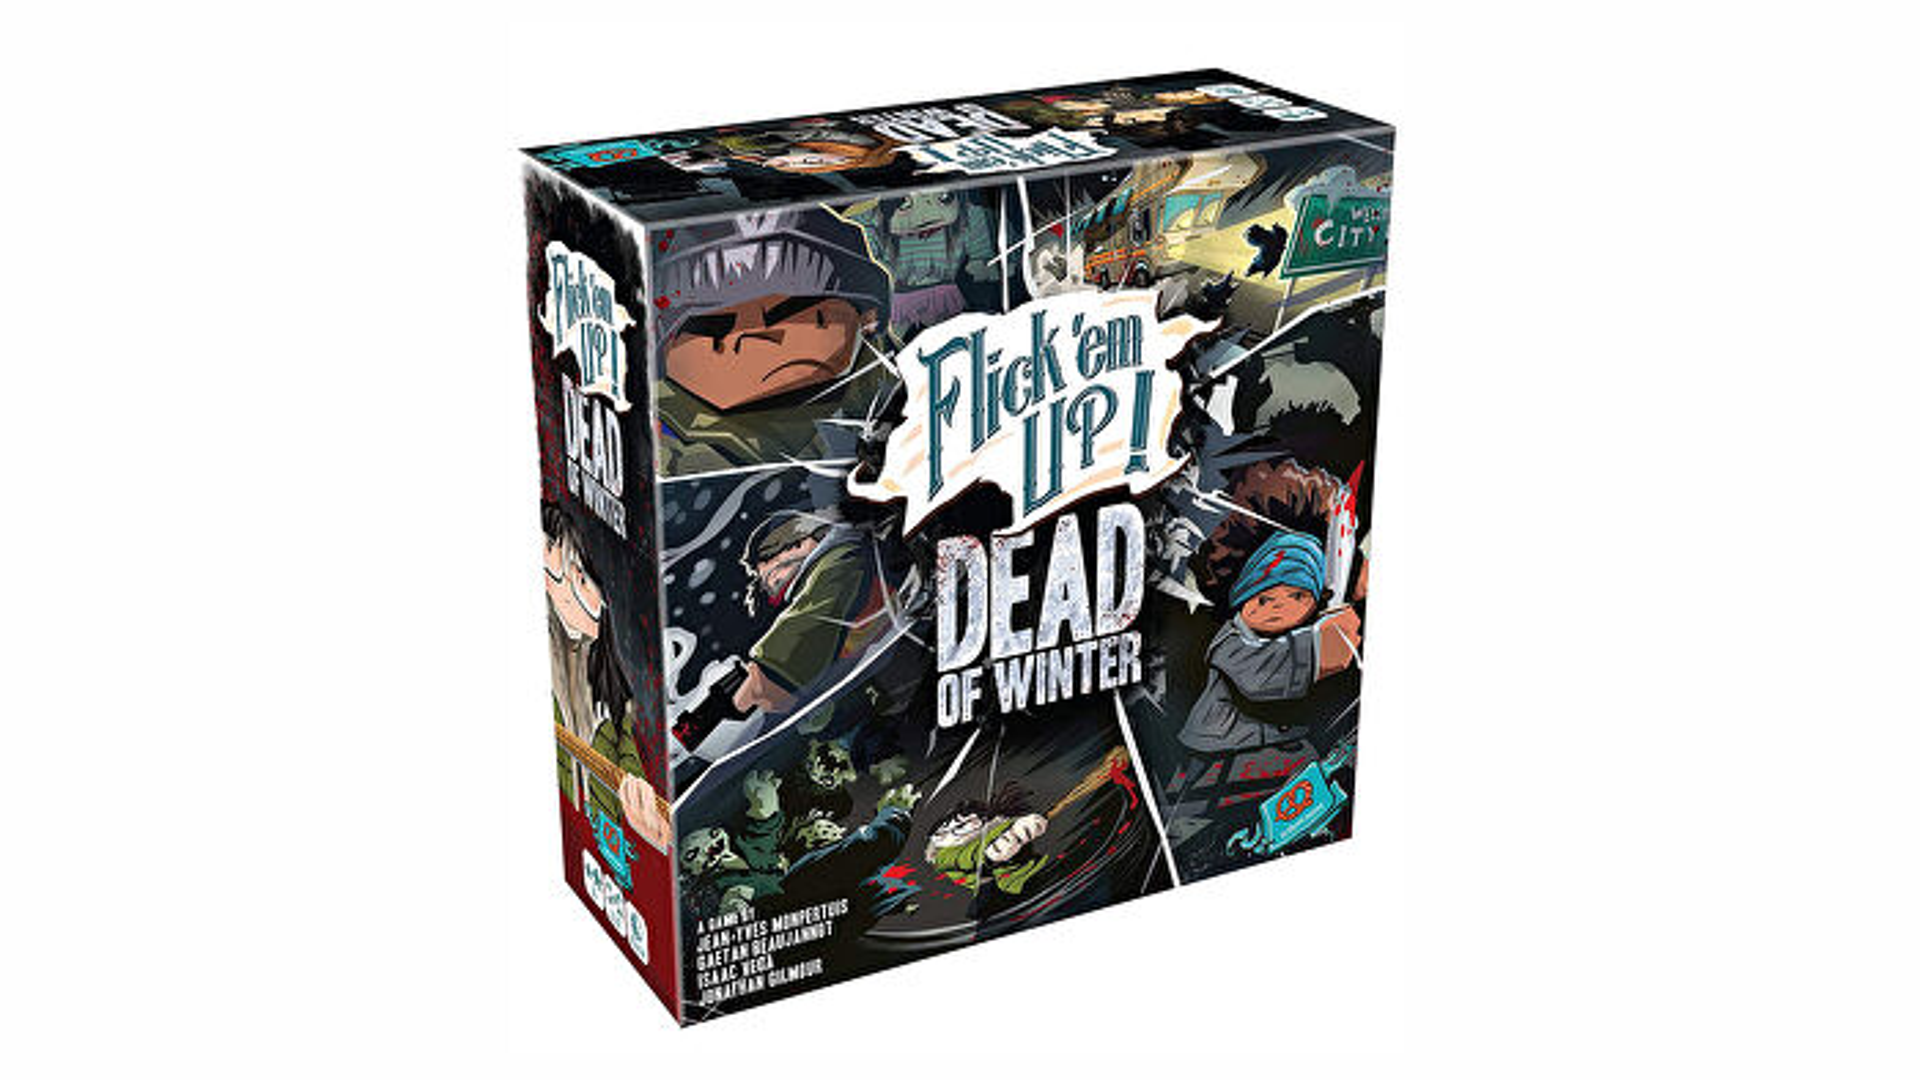 Flick em up dead of winter board game box